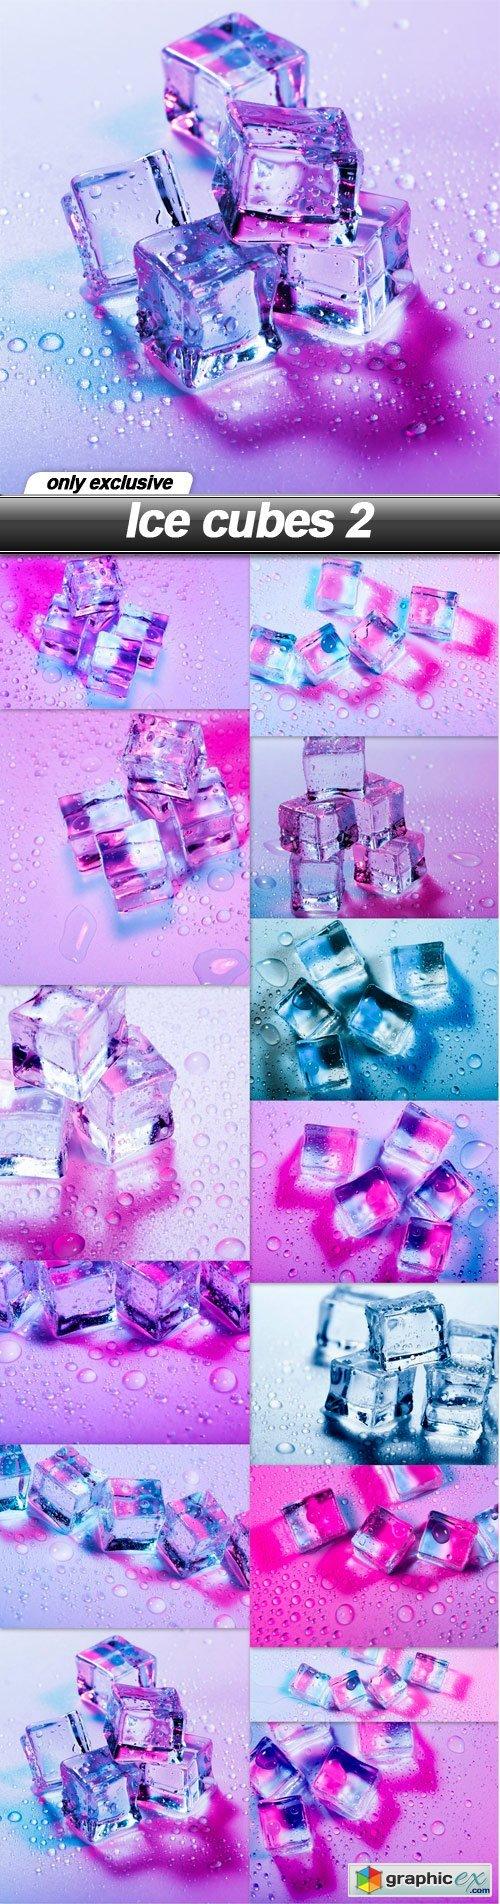 Ice Cubes 2 14 Uhq Jpeg Stock Images Free Graphics Stock Images Free Stock Images